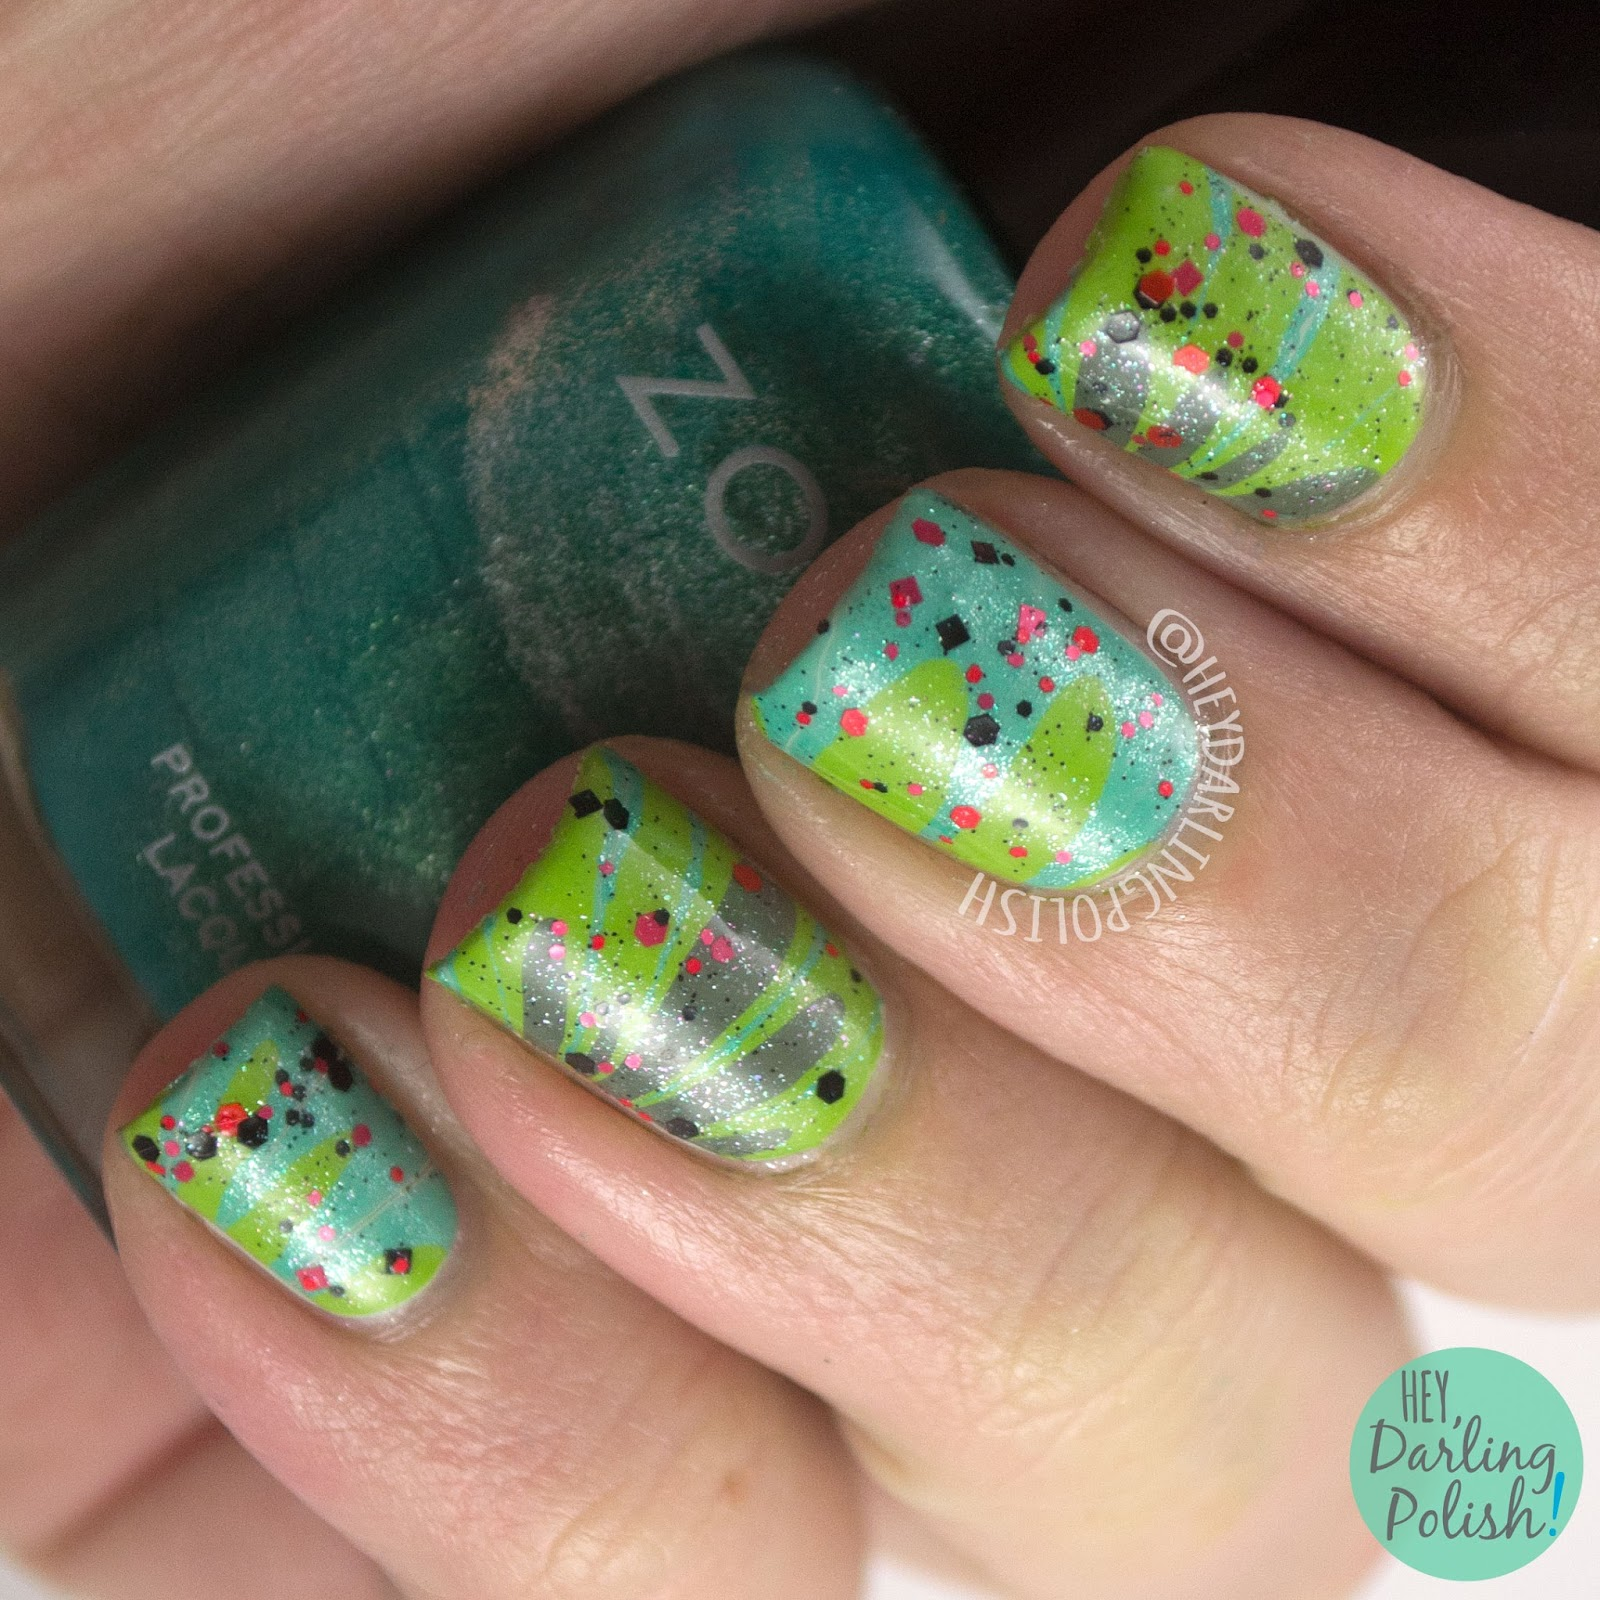 nails, nail art, nail polish, watermarble, glitter, indie, indie polish, zoya, hey darling polish, green, 31 day challenge, 31dc2014